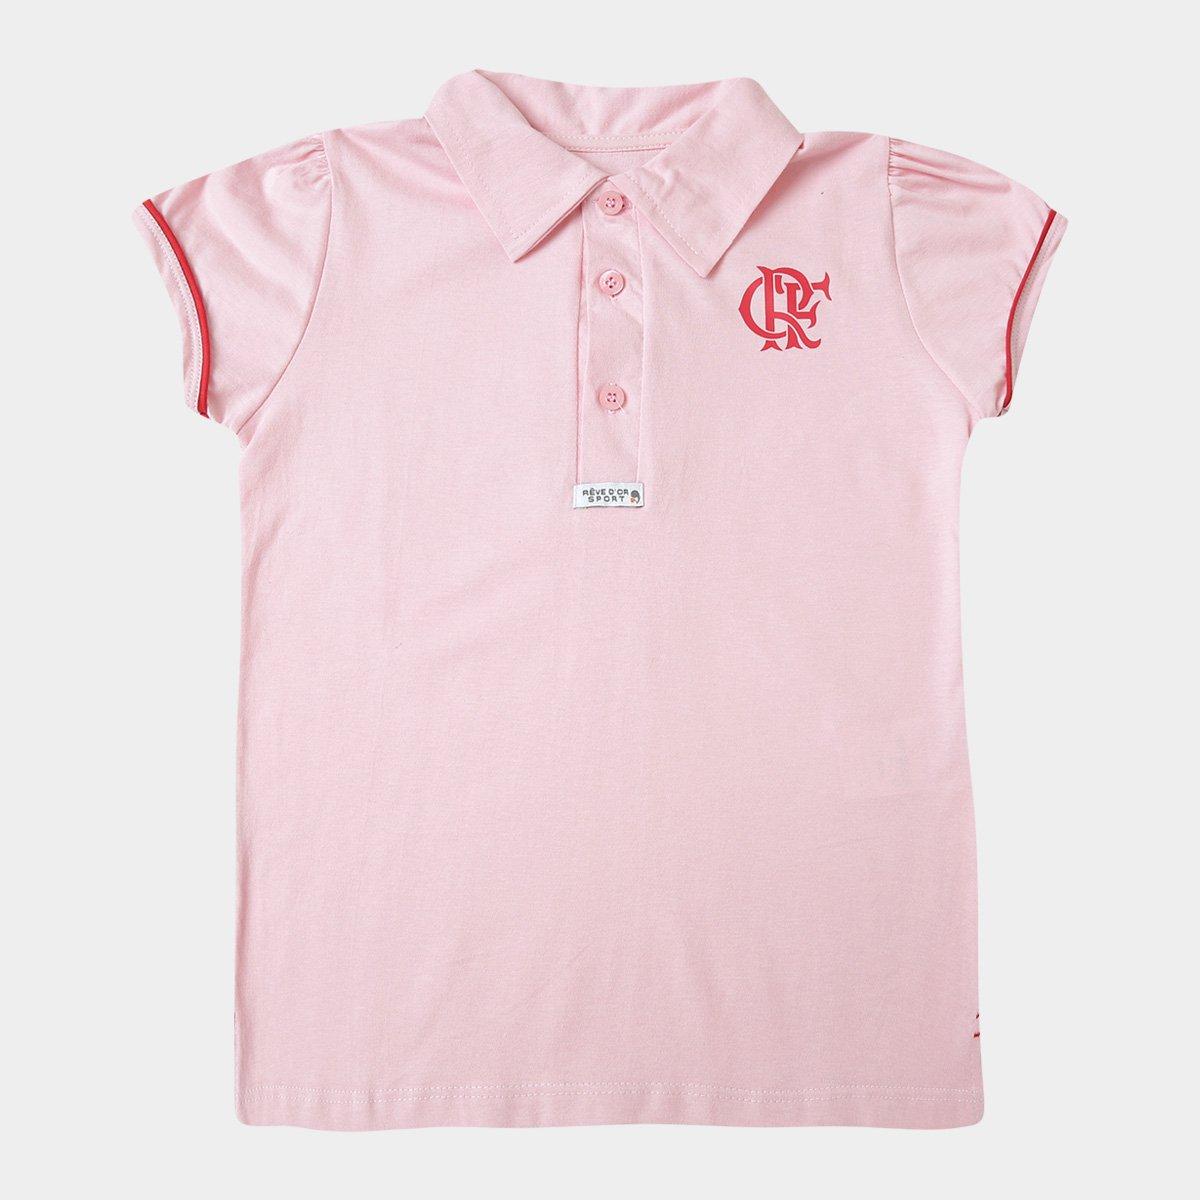 2c542abc5 Blusa Feminina Flamengo Vibe Cropped - Compre Agora